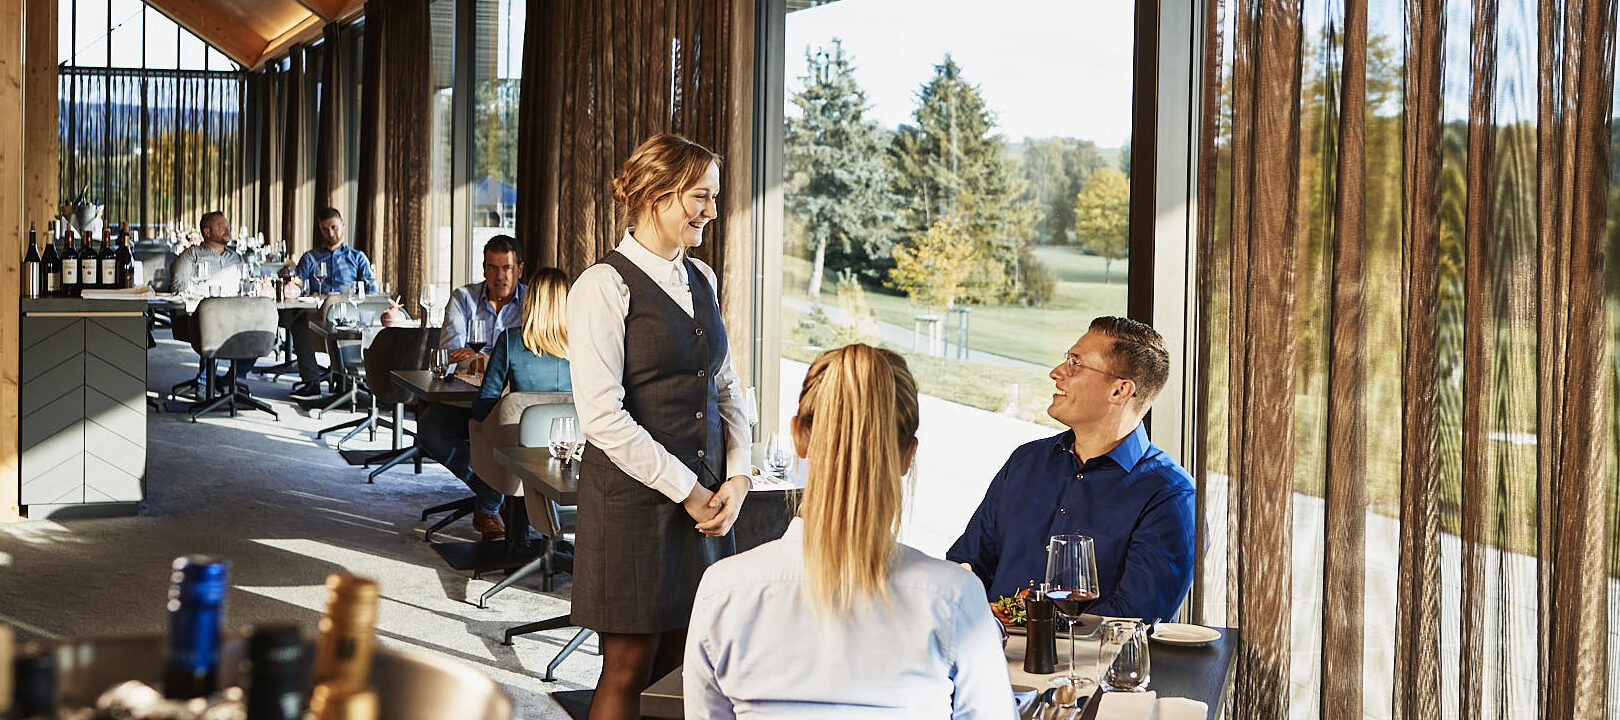 Öschberghof Service Kellnerin im Restaurant